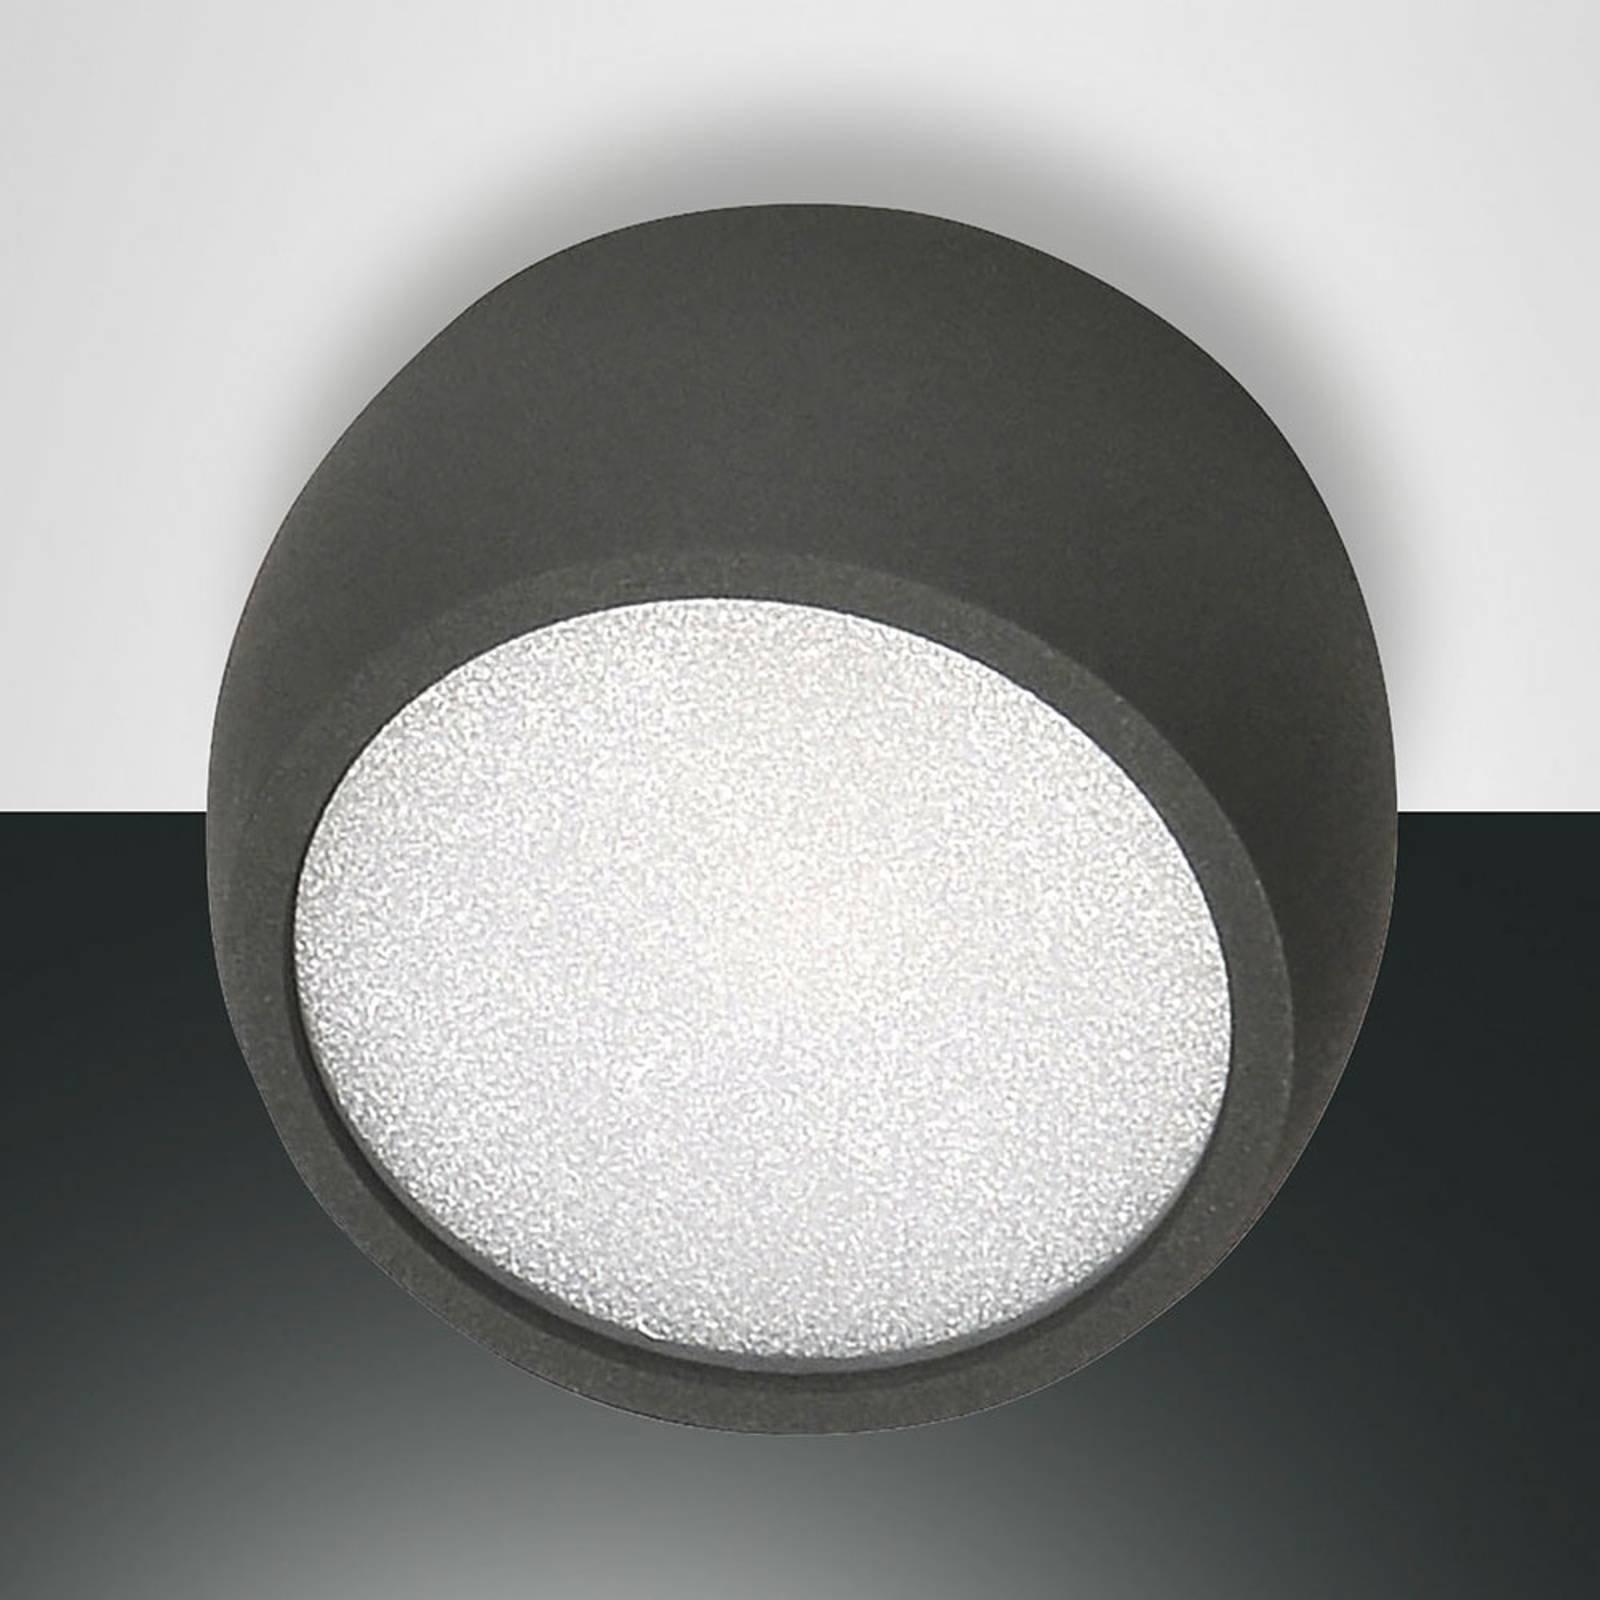 Rund LED-downlight Vasto, antrasitt